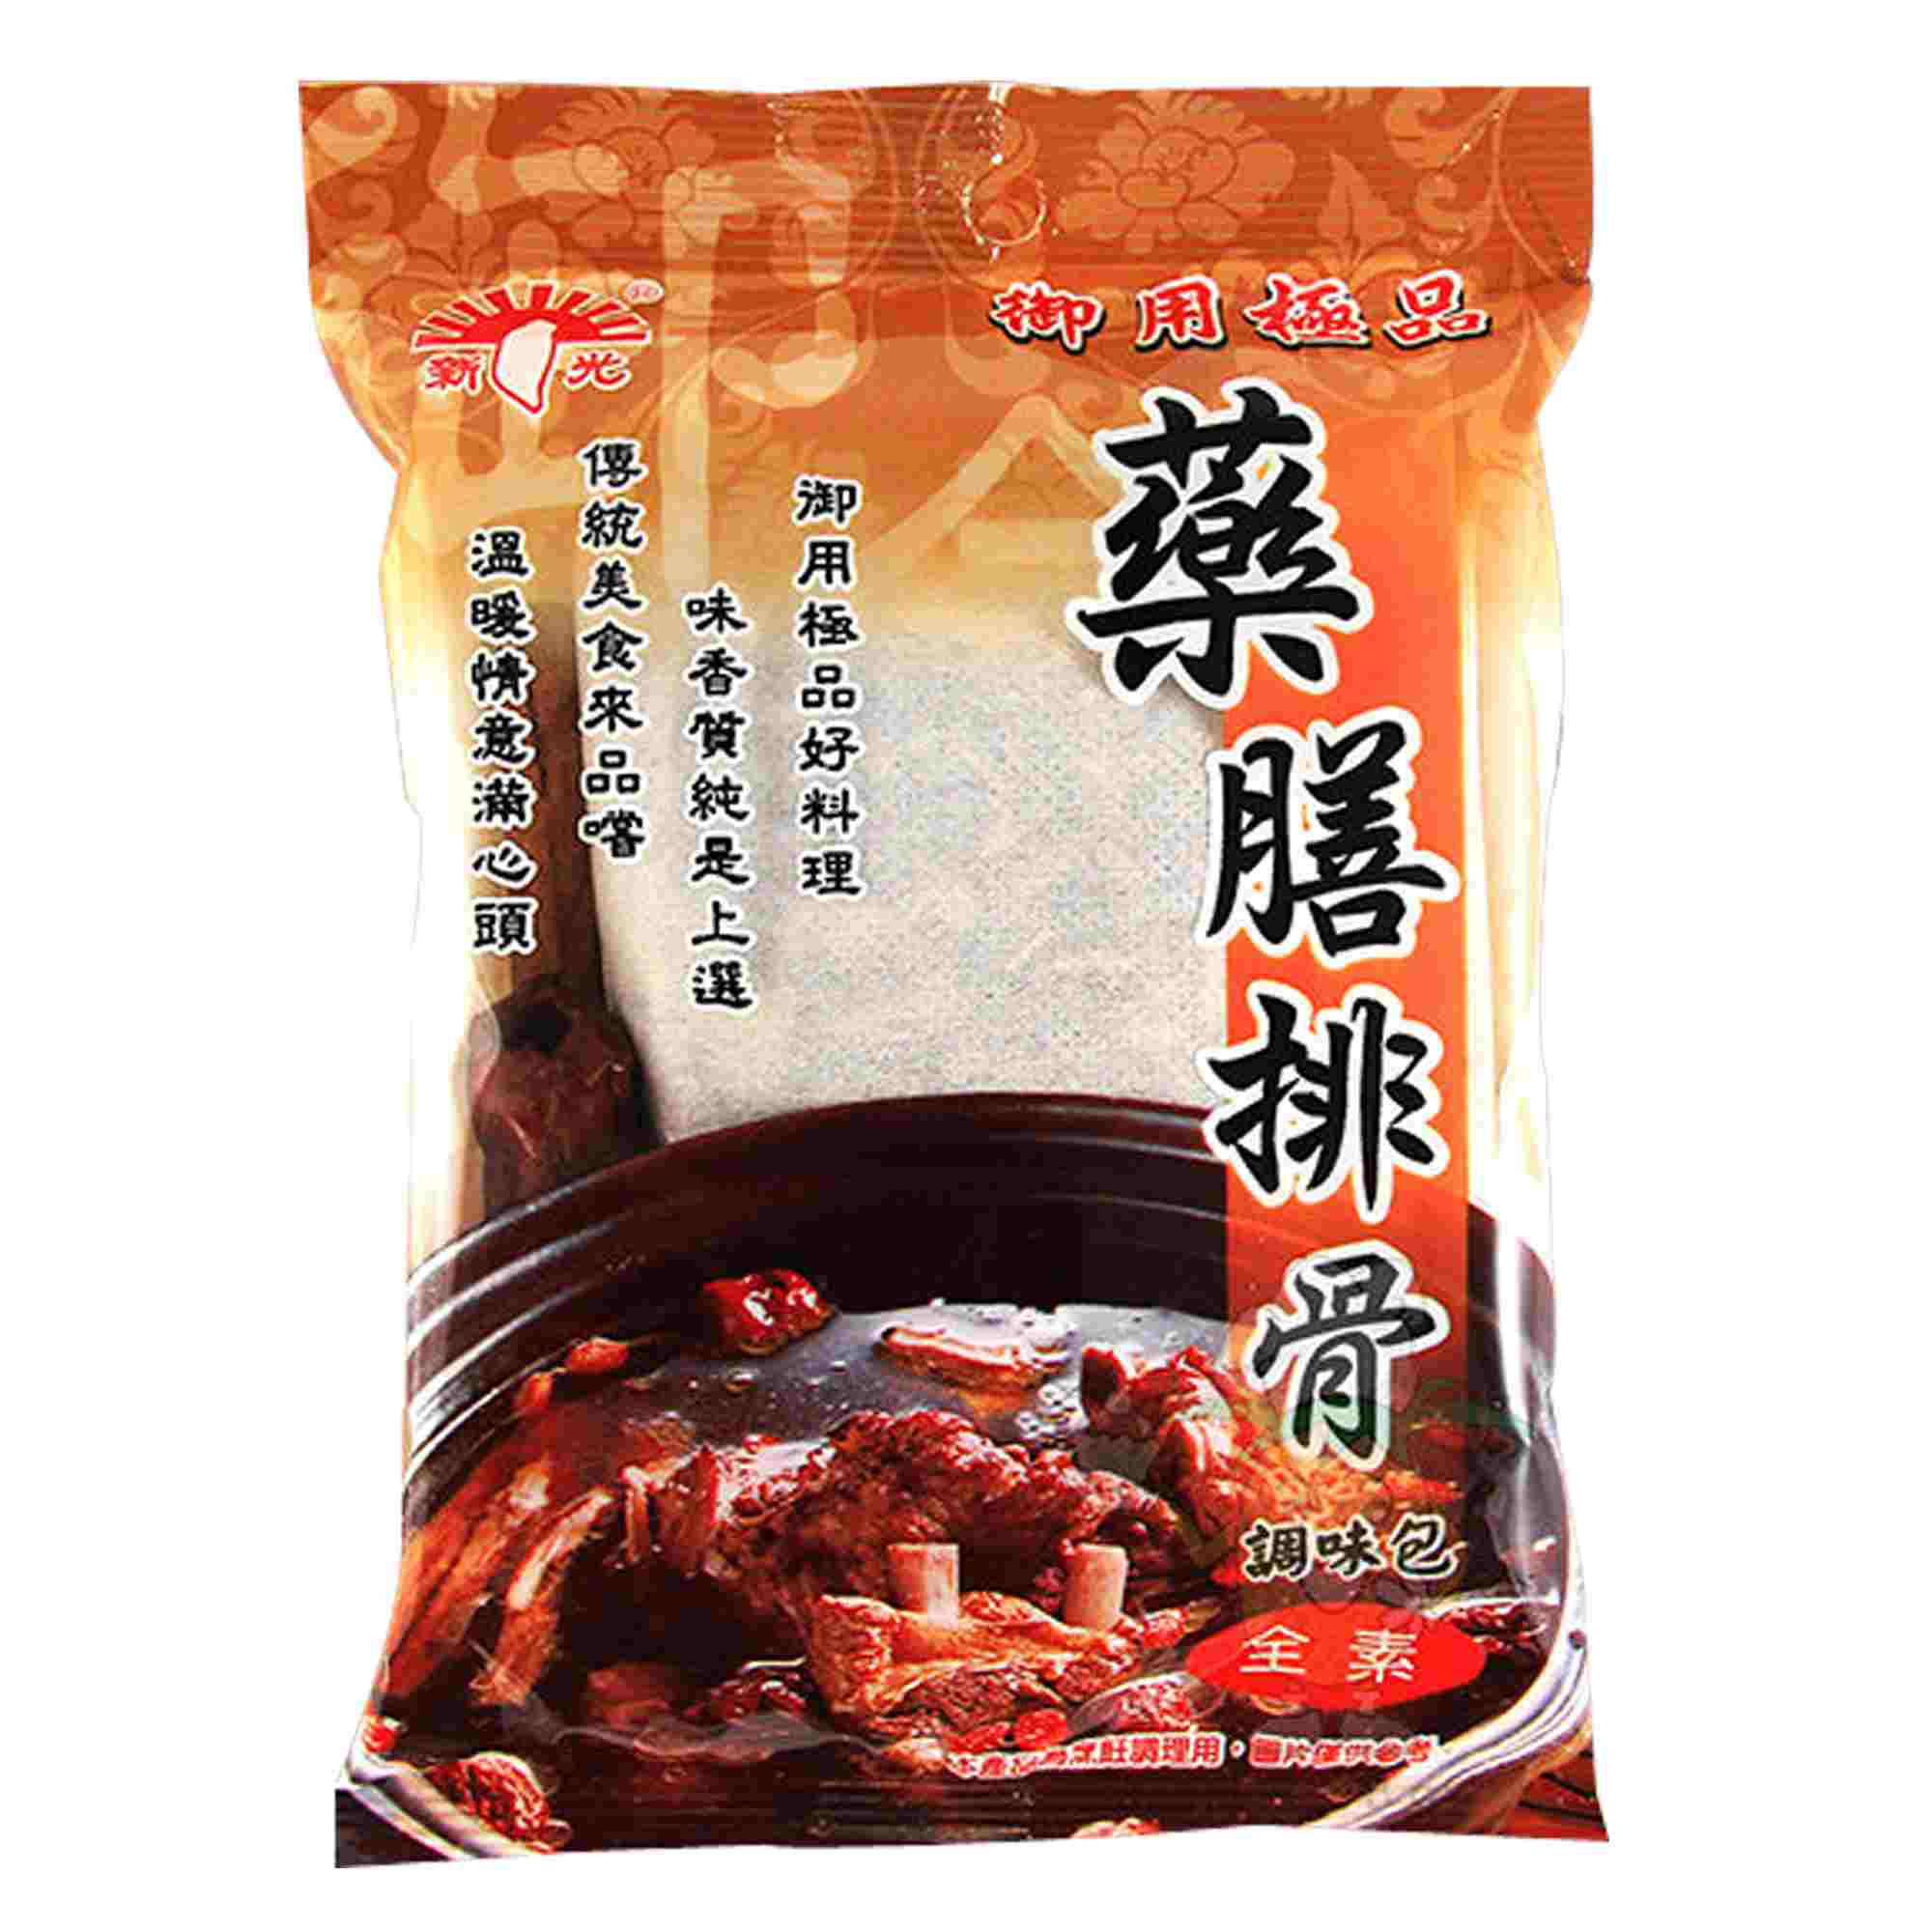 Image hsin kuang Herbal Rib Soup Yao Shan Pai Gu 新光 - 药膳排骨 60grams